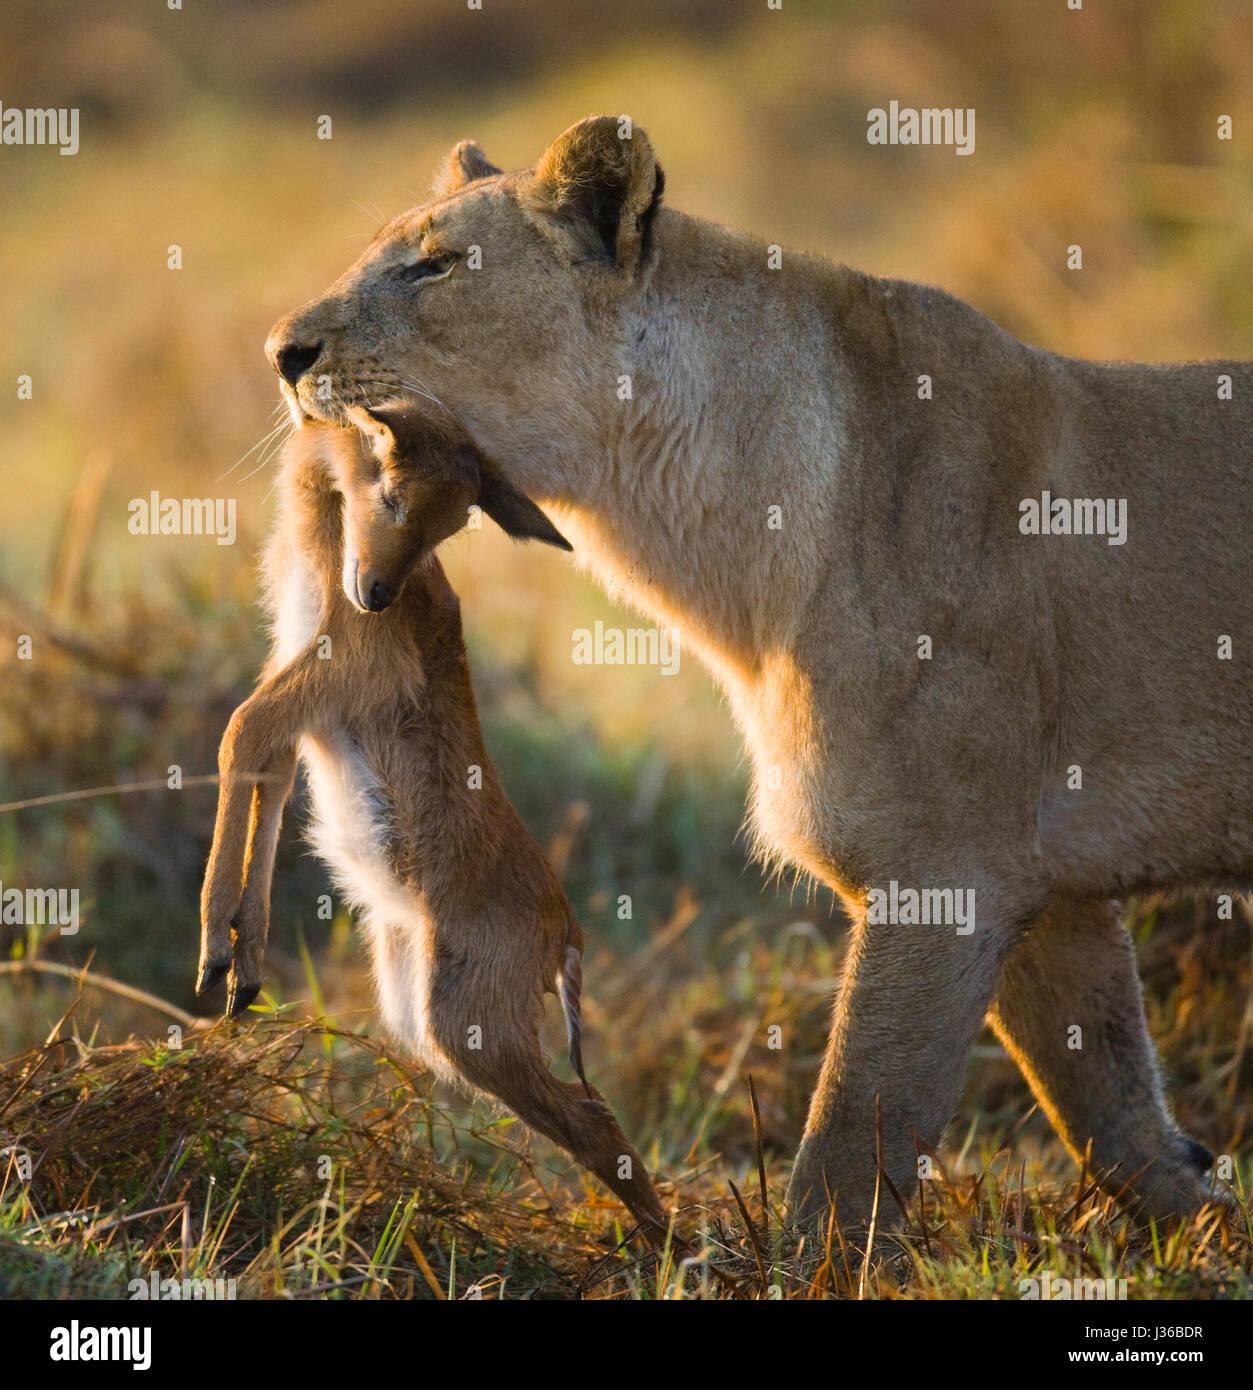 Lioness with prey. Botswana. Okavango Delta. An excellent illustration. - Stock Image